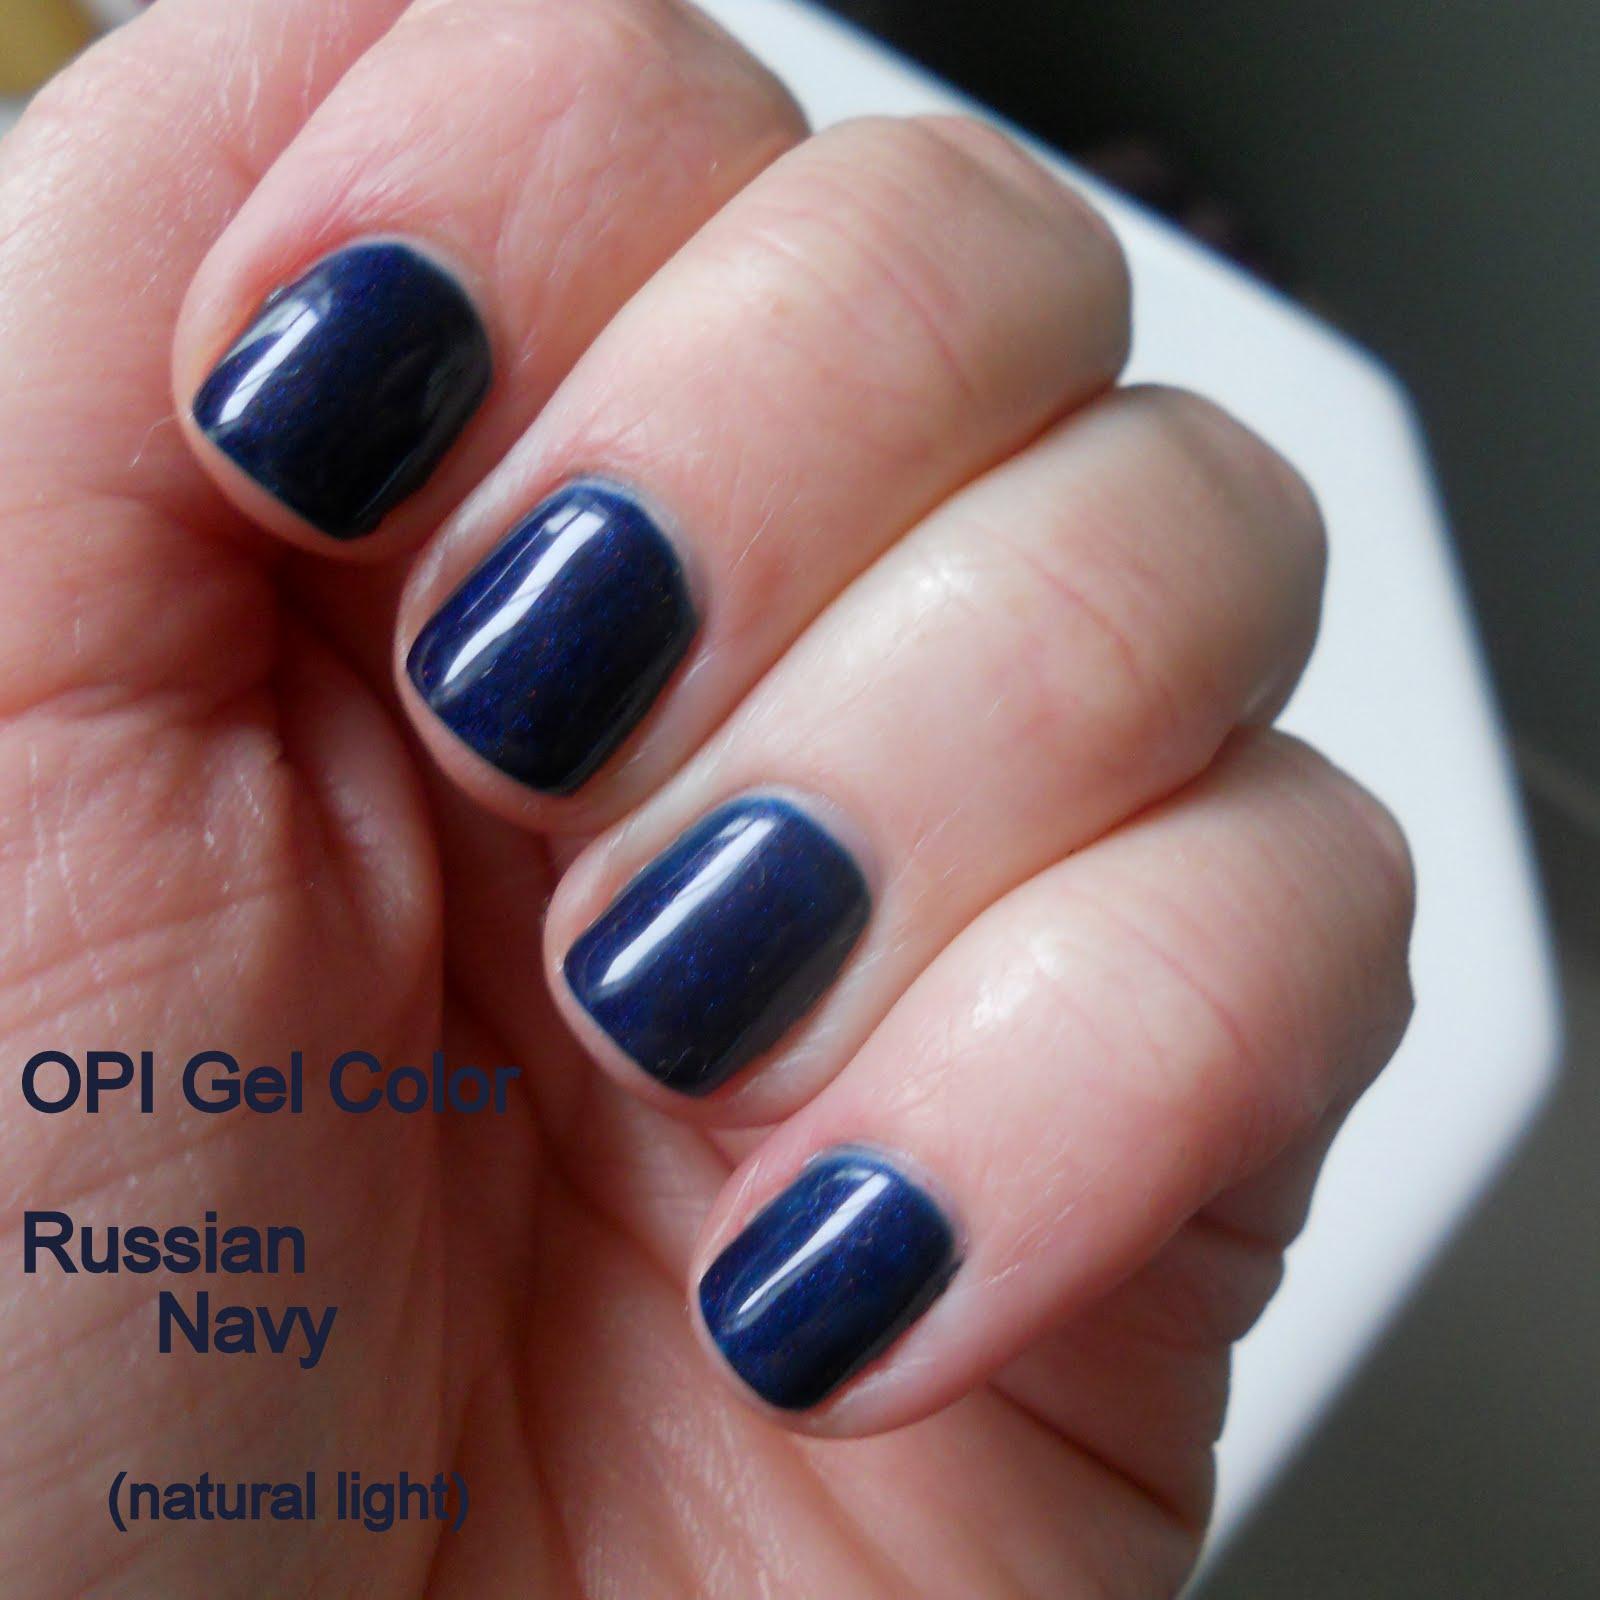 SMITTEN...in cleveland: OPI Gel Polish - Russian Navy